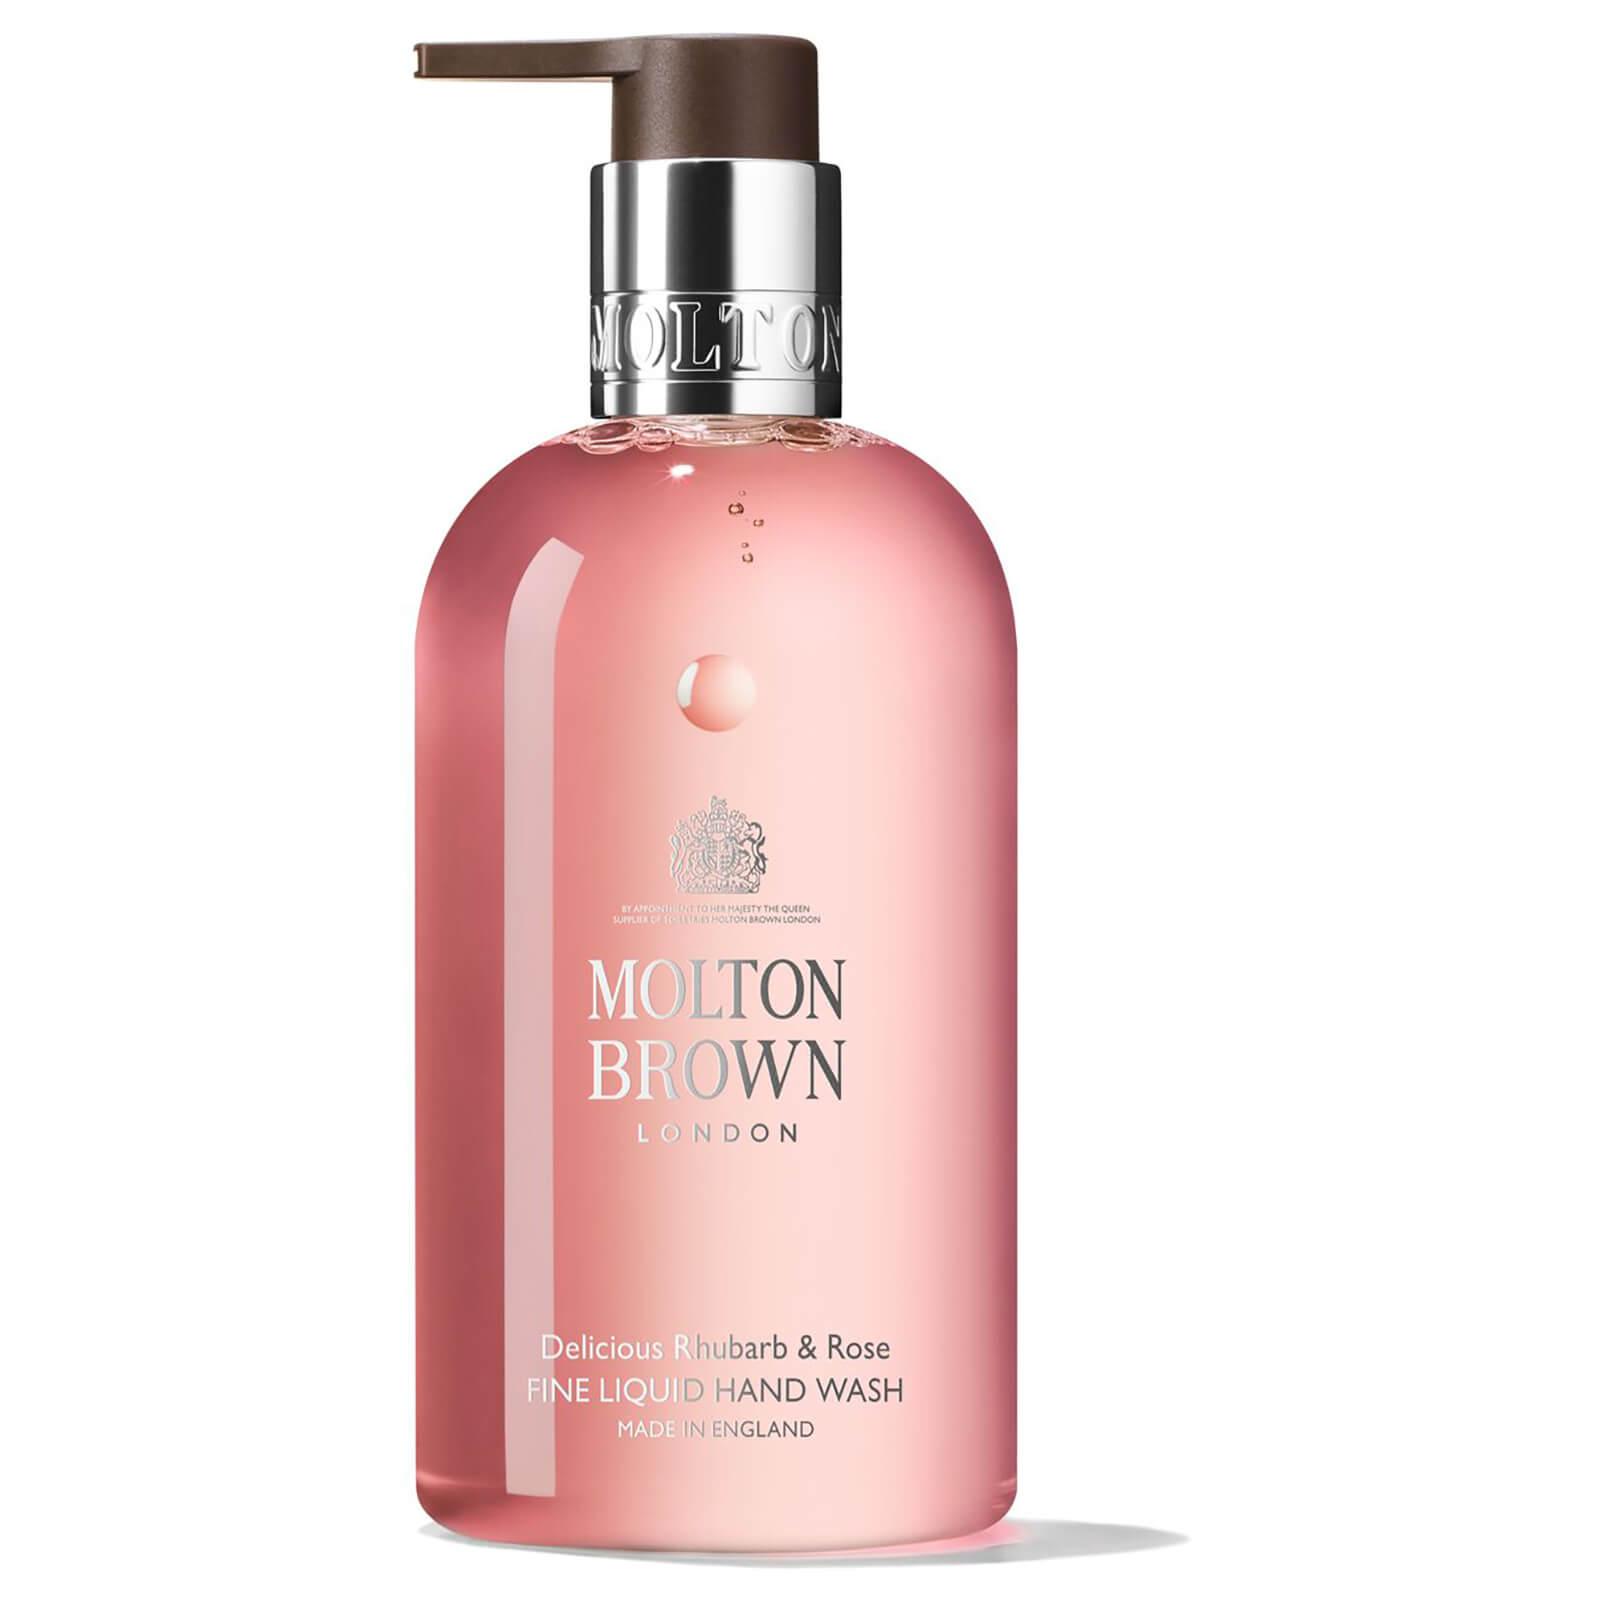 Molton Brown Delicious Rhubarb and Rose Fine Liquid Hand Wash (300ml)